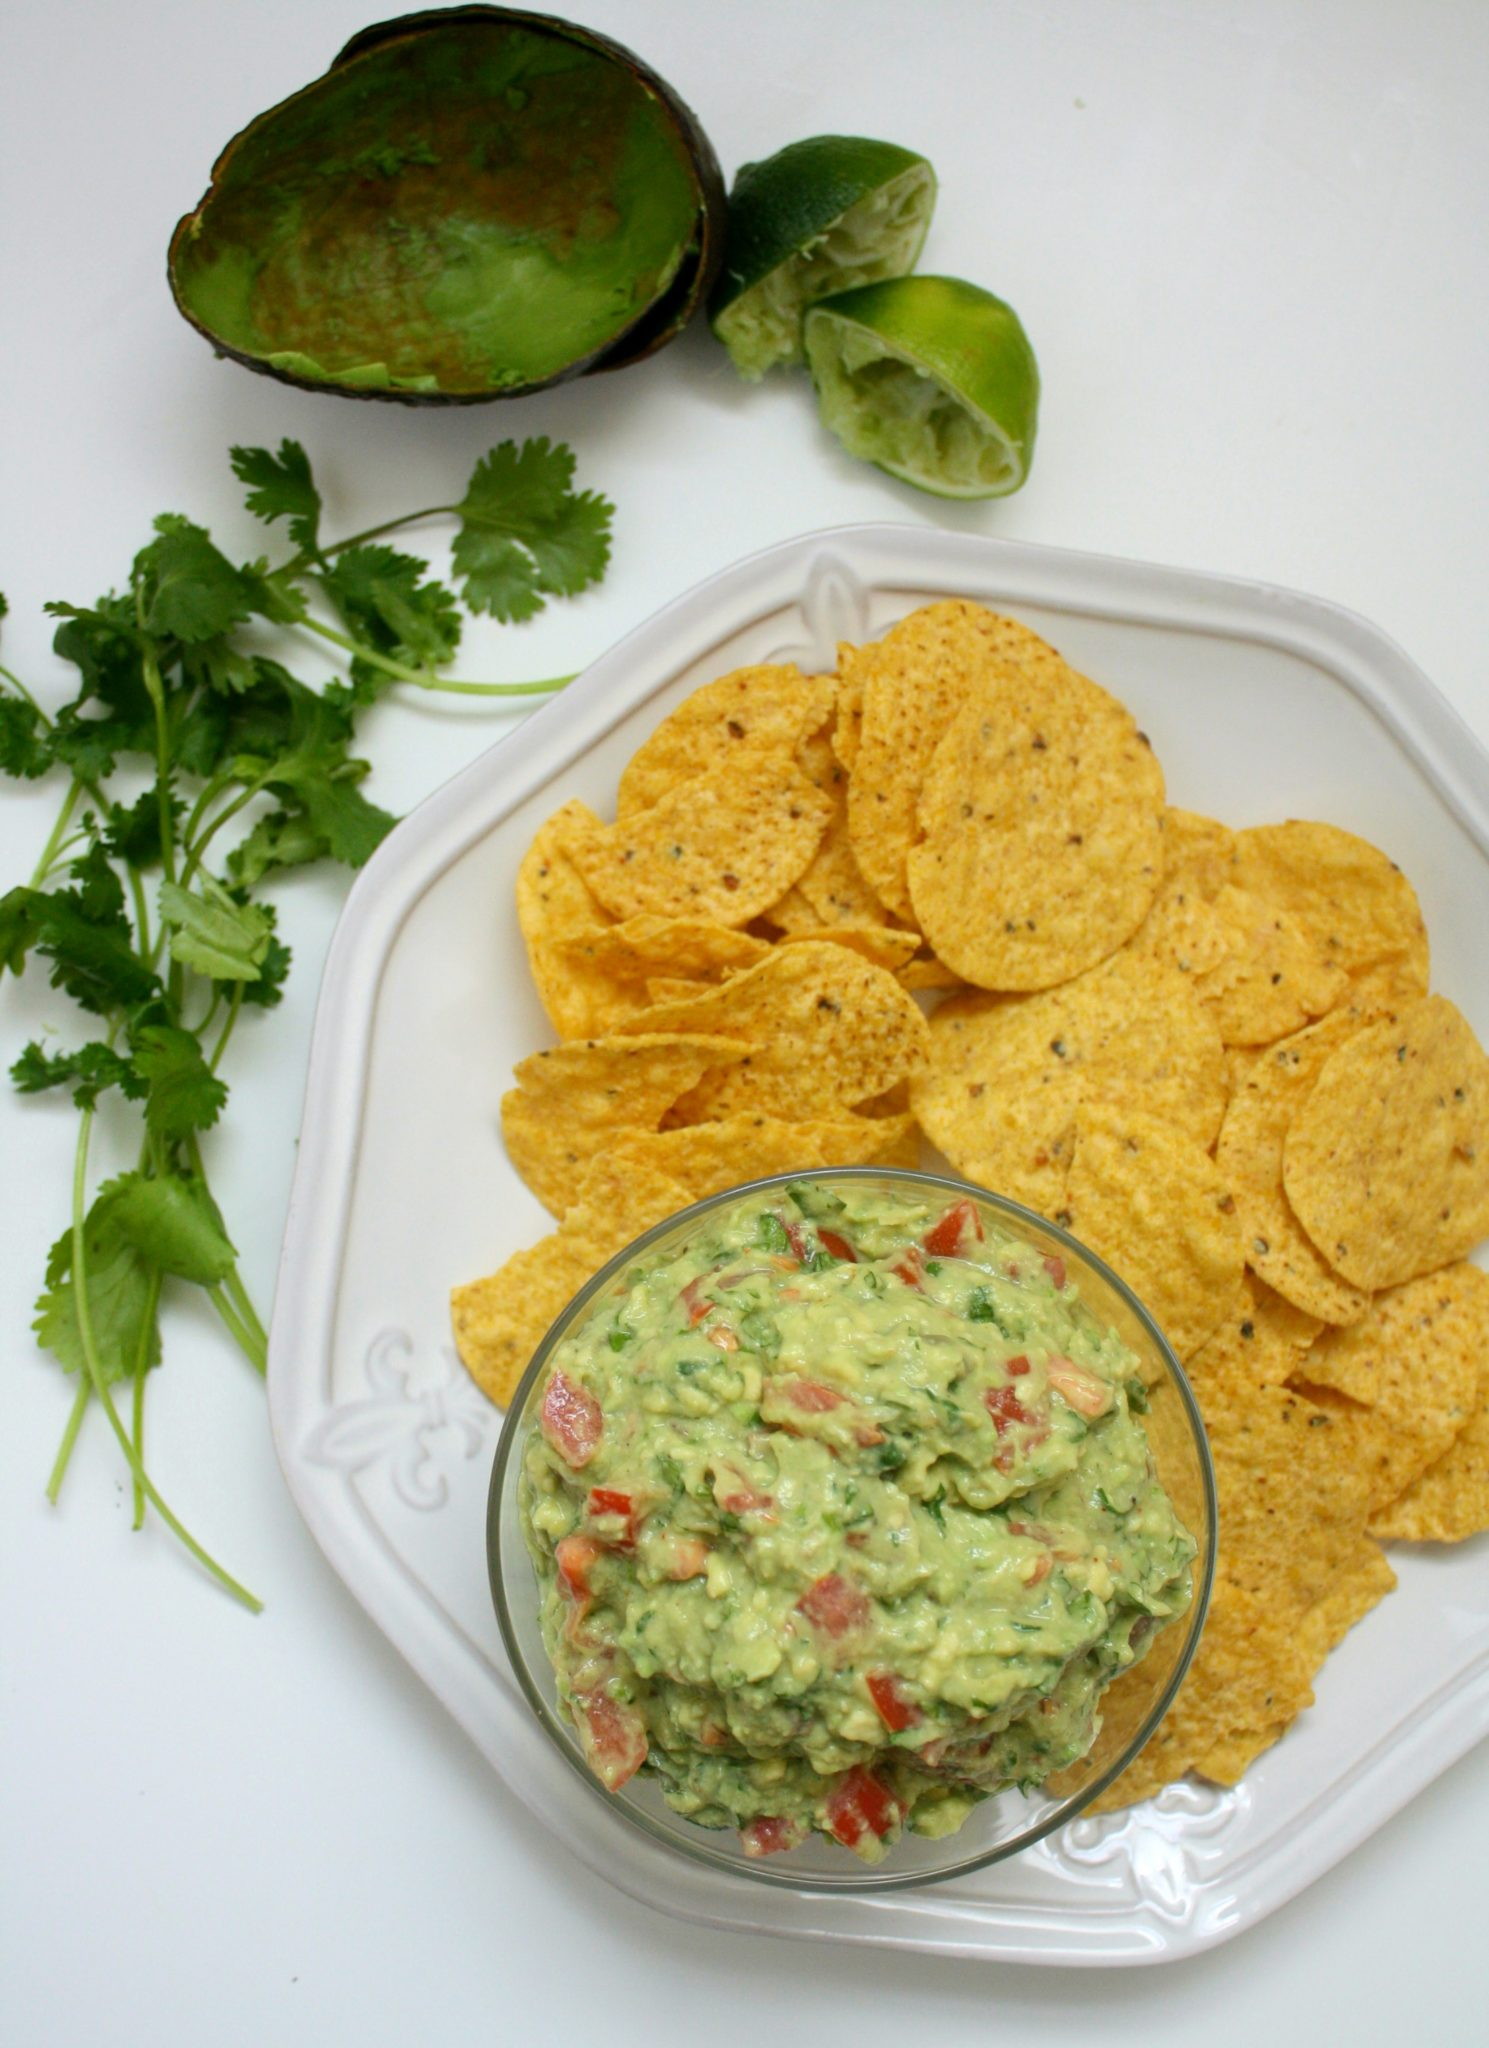 Guacamole original de guacamole mexicano! Pronto em 10 minutinhos!